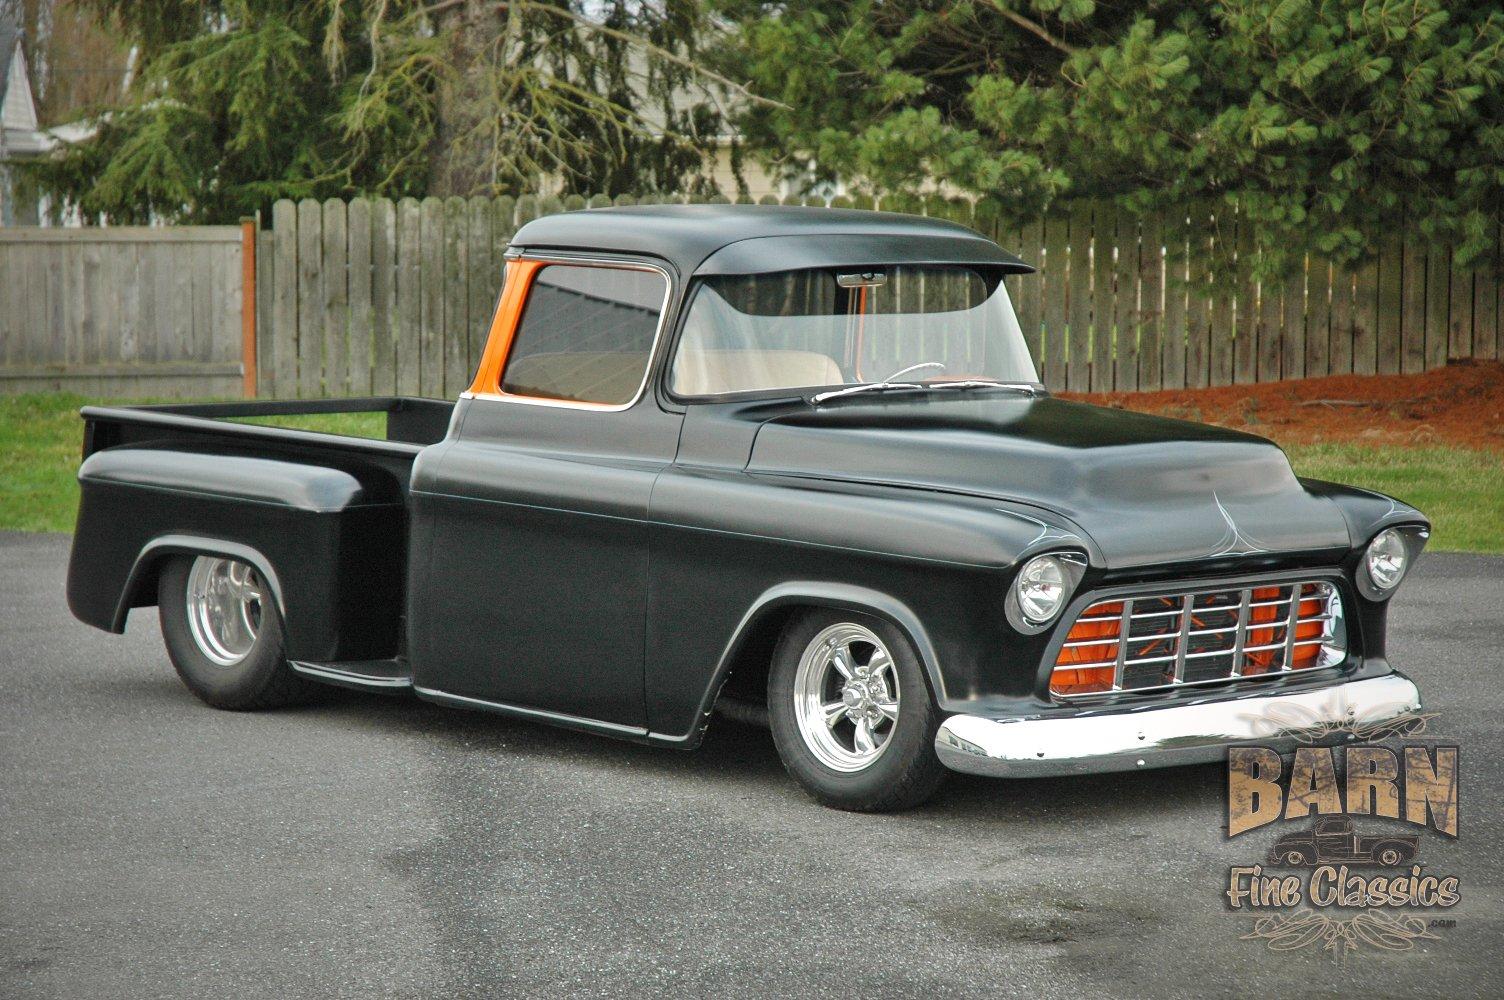 Pro Street Wiring Harness Library 1955 Chevy Dash Chevrolet Pickop Pickup Streetrod Rod Black Usa 1500x1000 01 Wallpaper 1504x1000